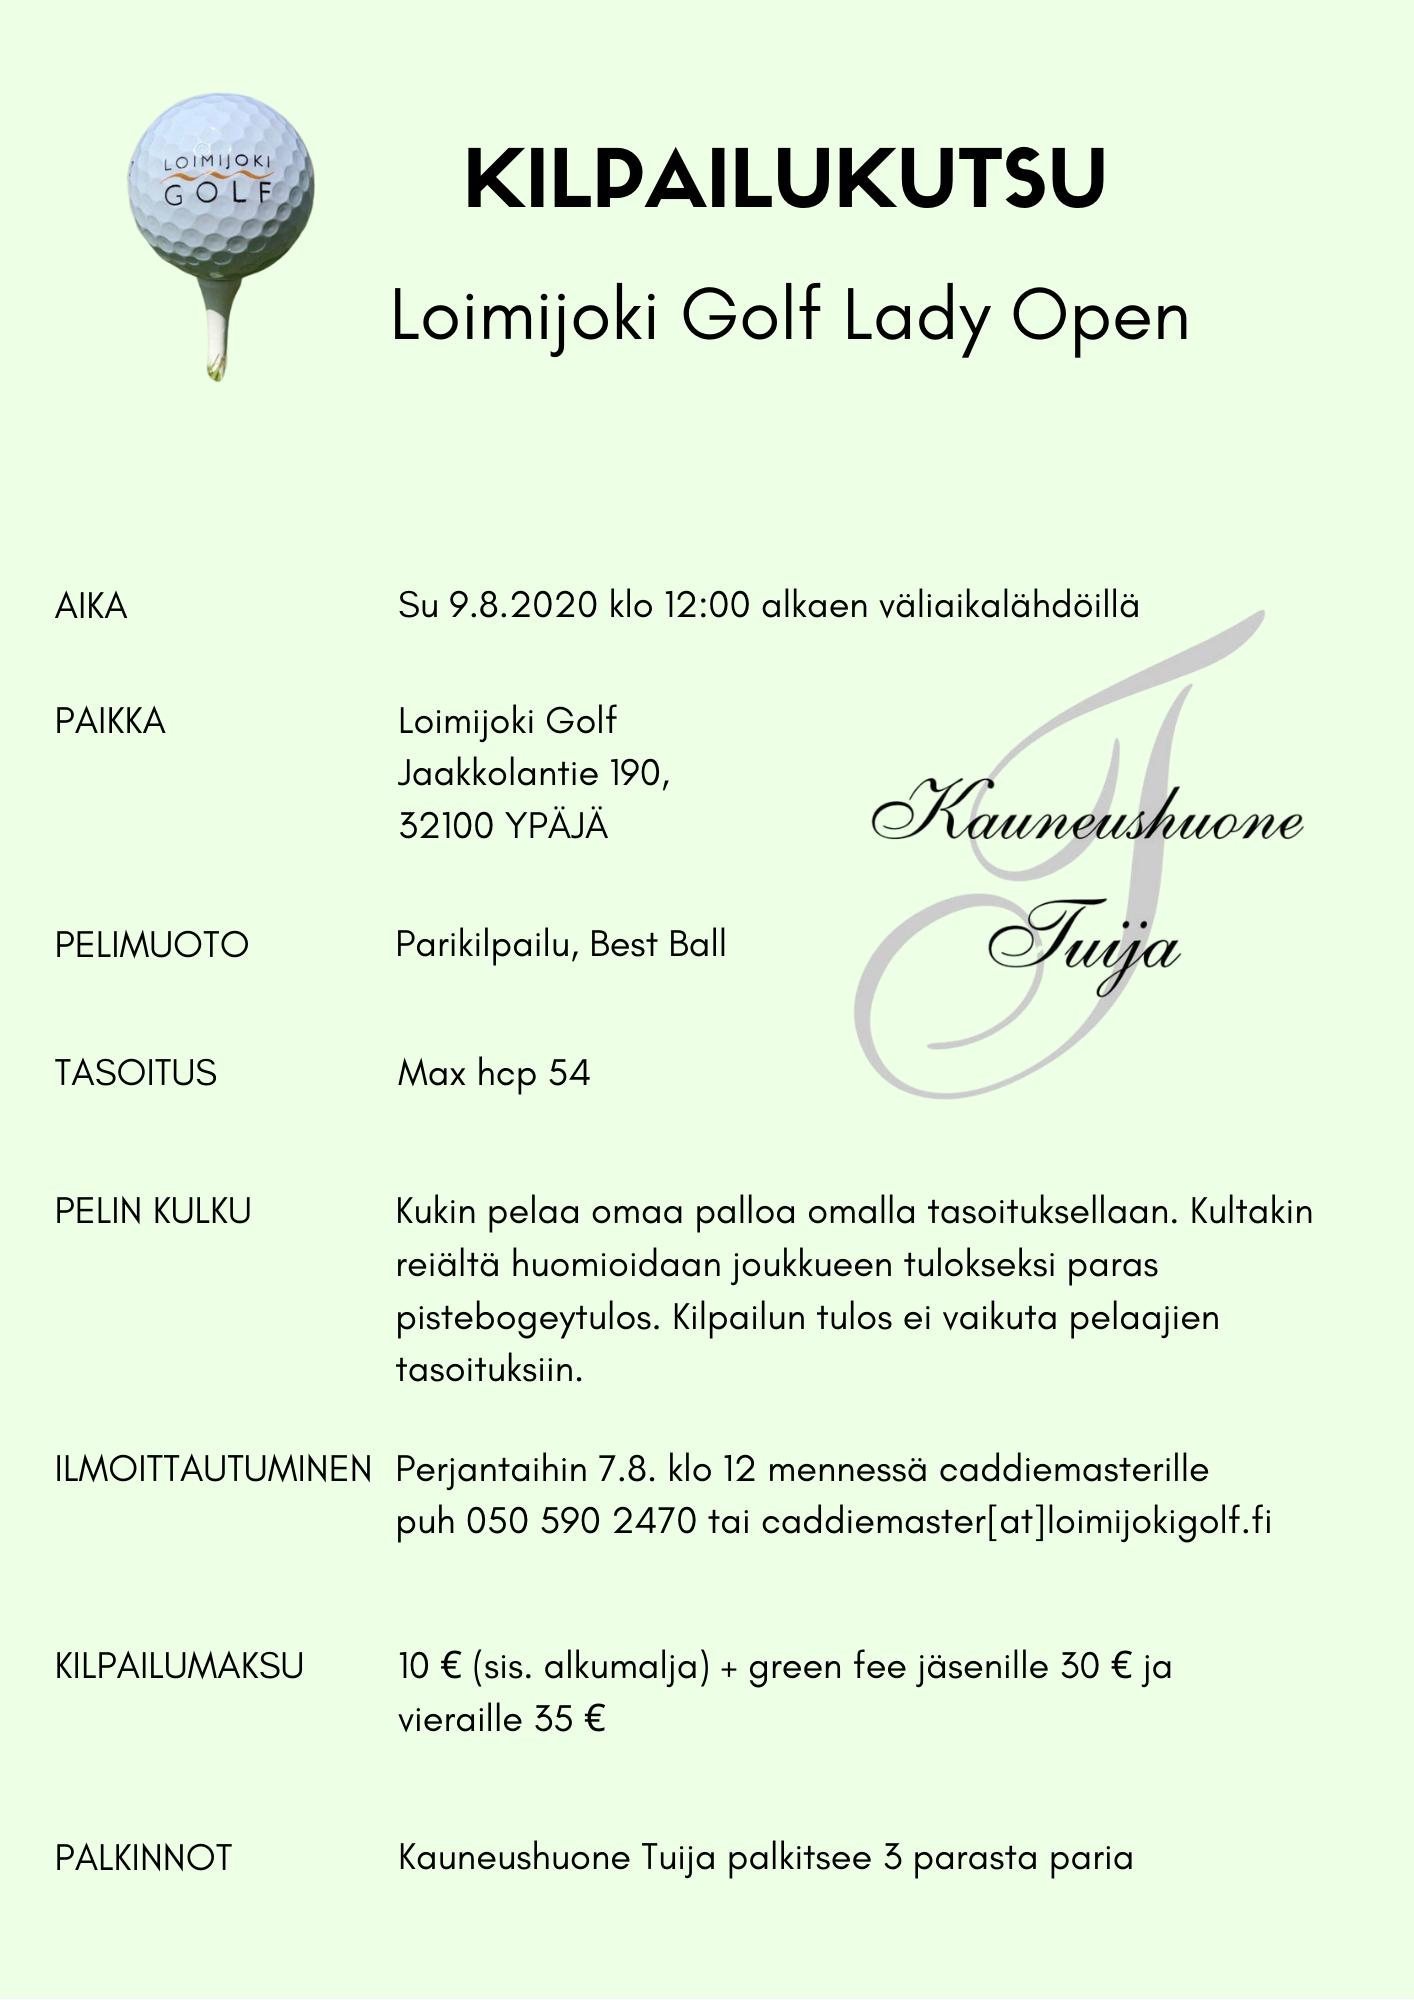 Loimijoki Golf Lady Open